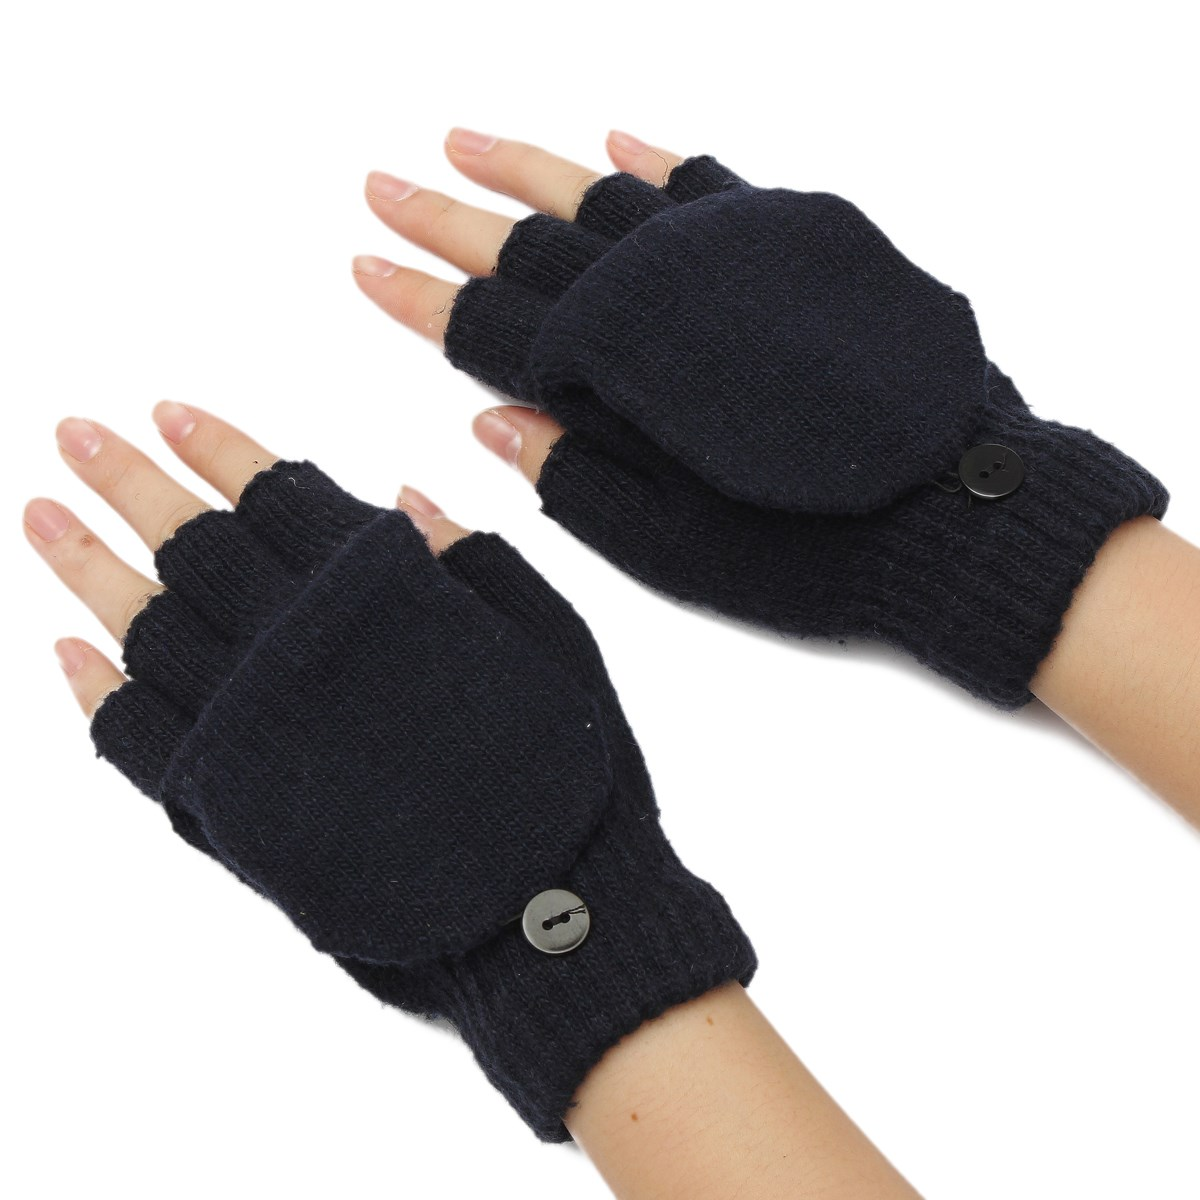 Fingerless gloves eso - 2016 Thermal Men Ladies Winter Half Finger Gloves Flip Fingerless Knitted Mittens Autumn Winter Woman Man Flanging Glove Mitten